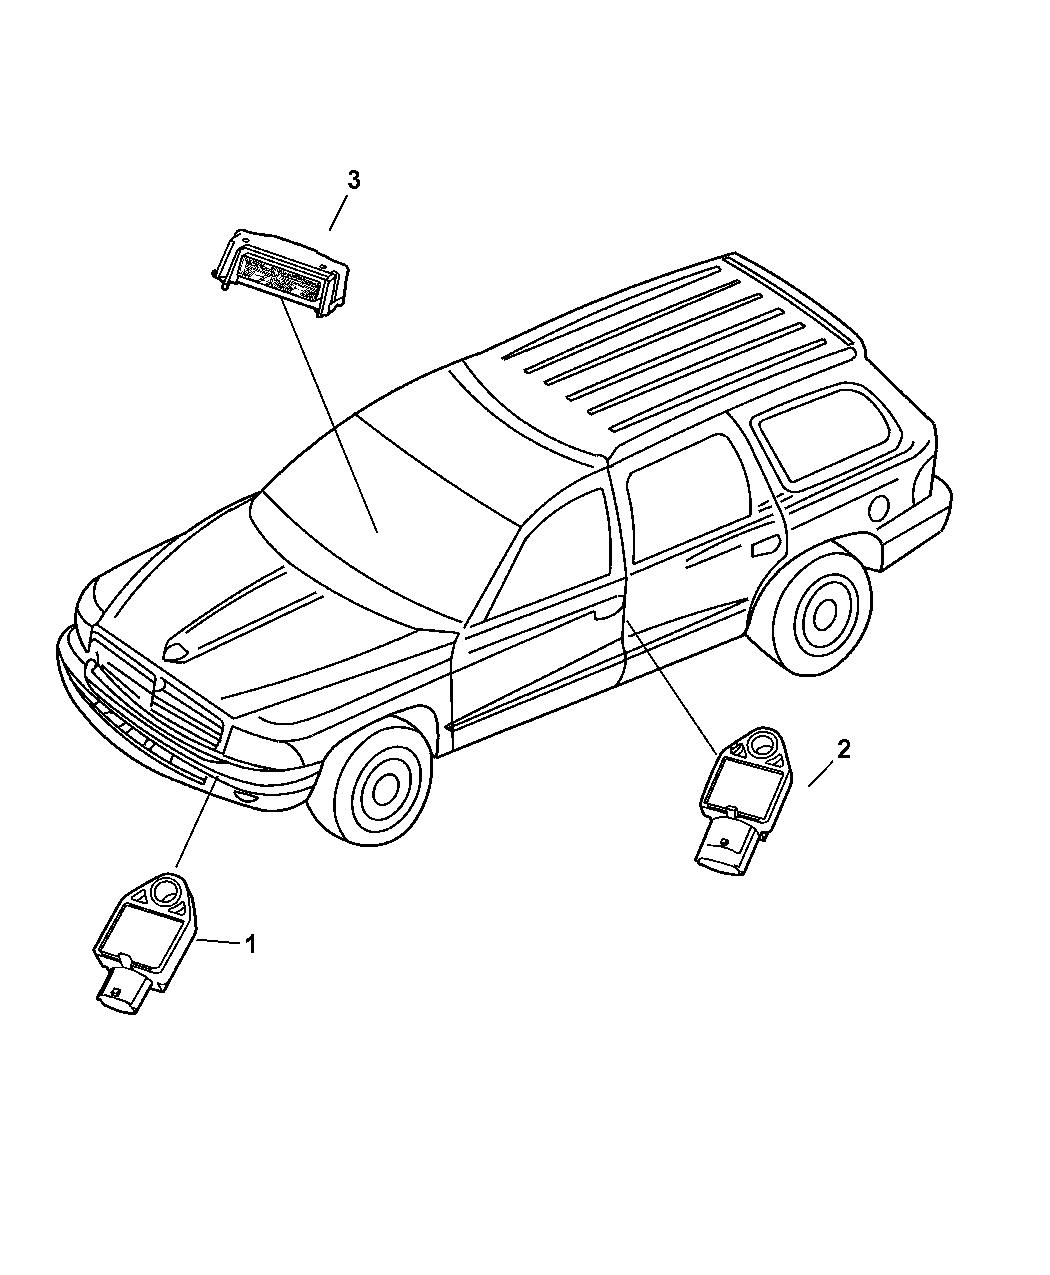 2004 Dodge Durango Air Bag Modules Sensors